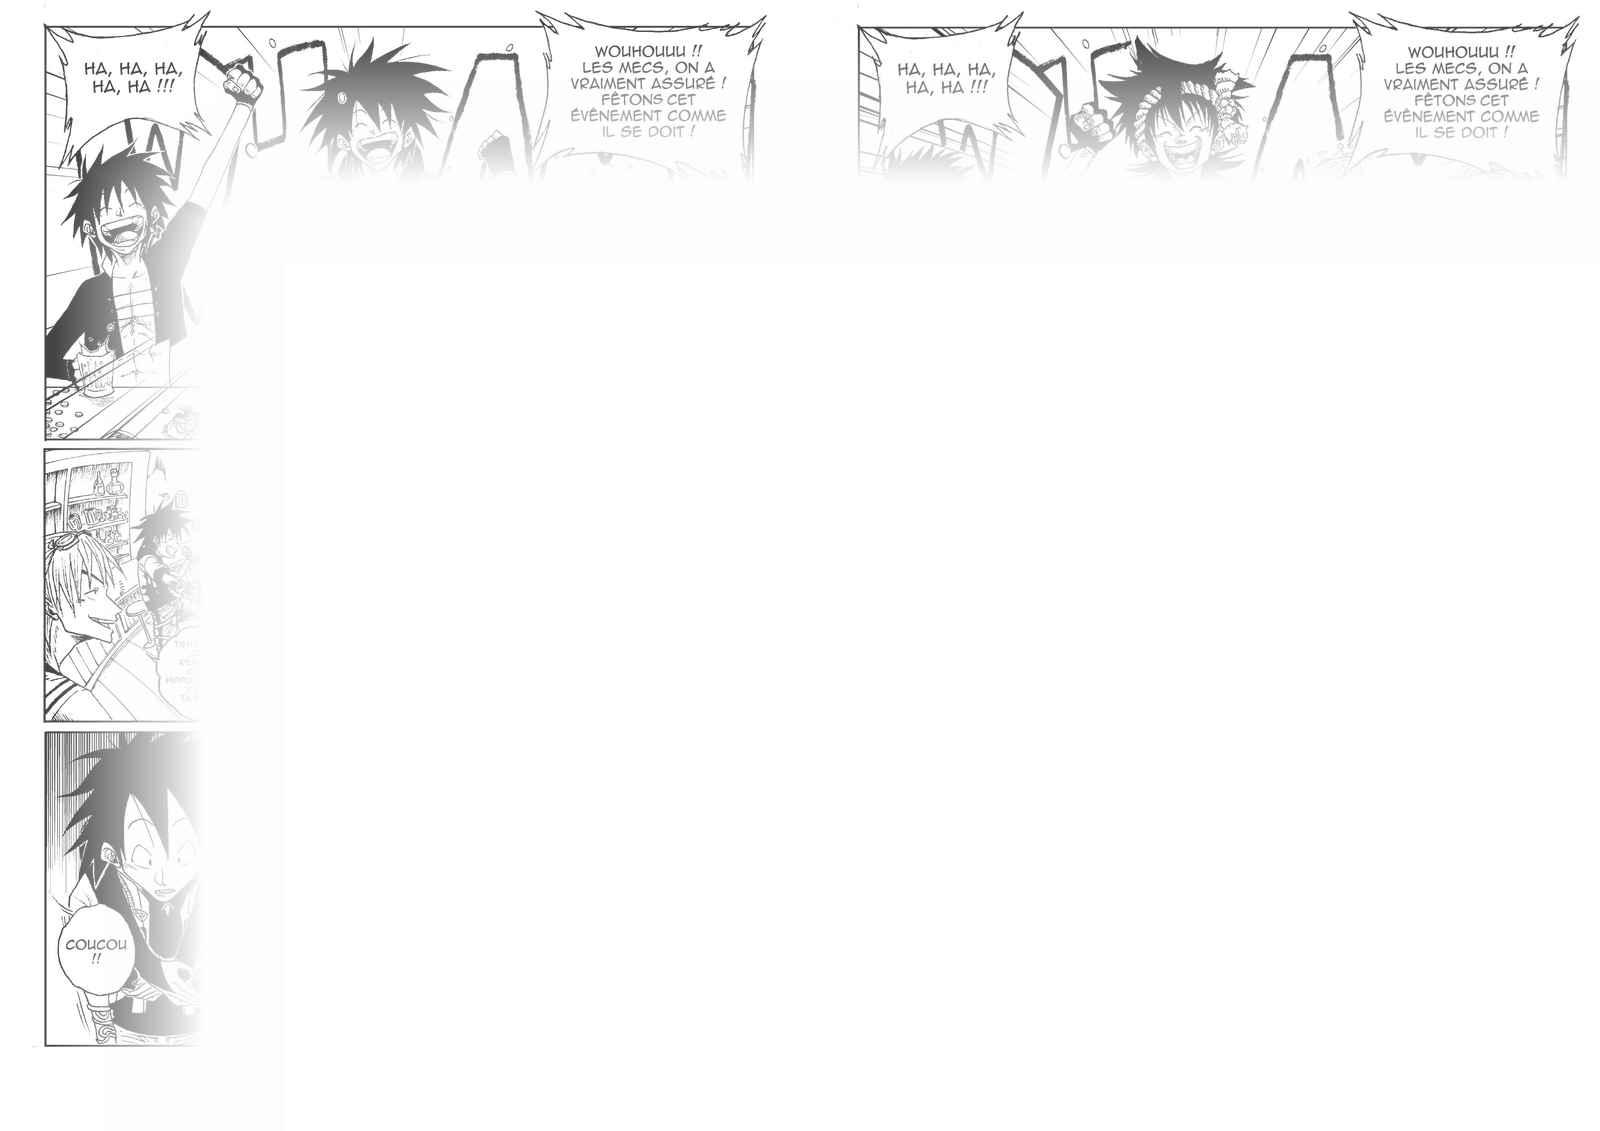 The Last Sasori : Chapitre 5 page 2